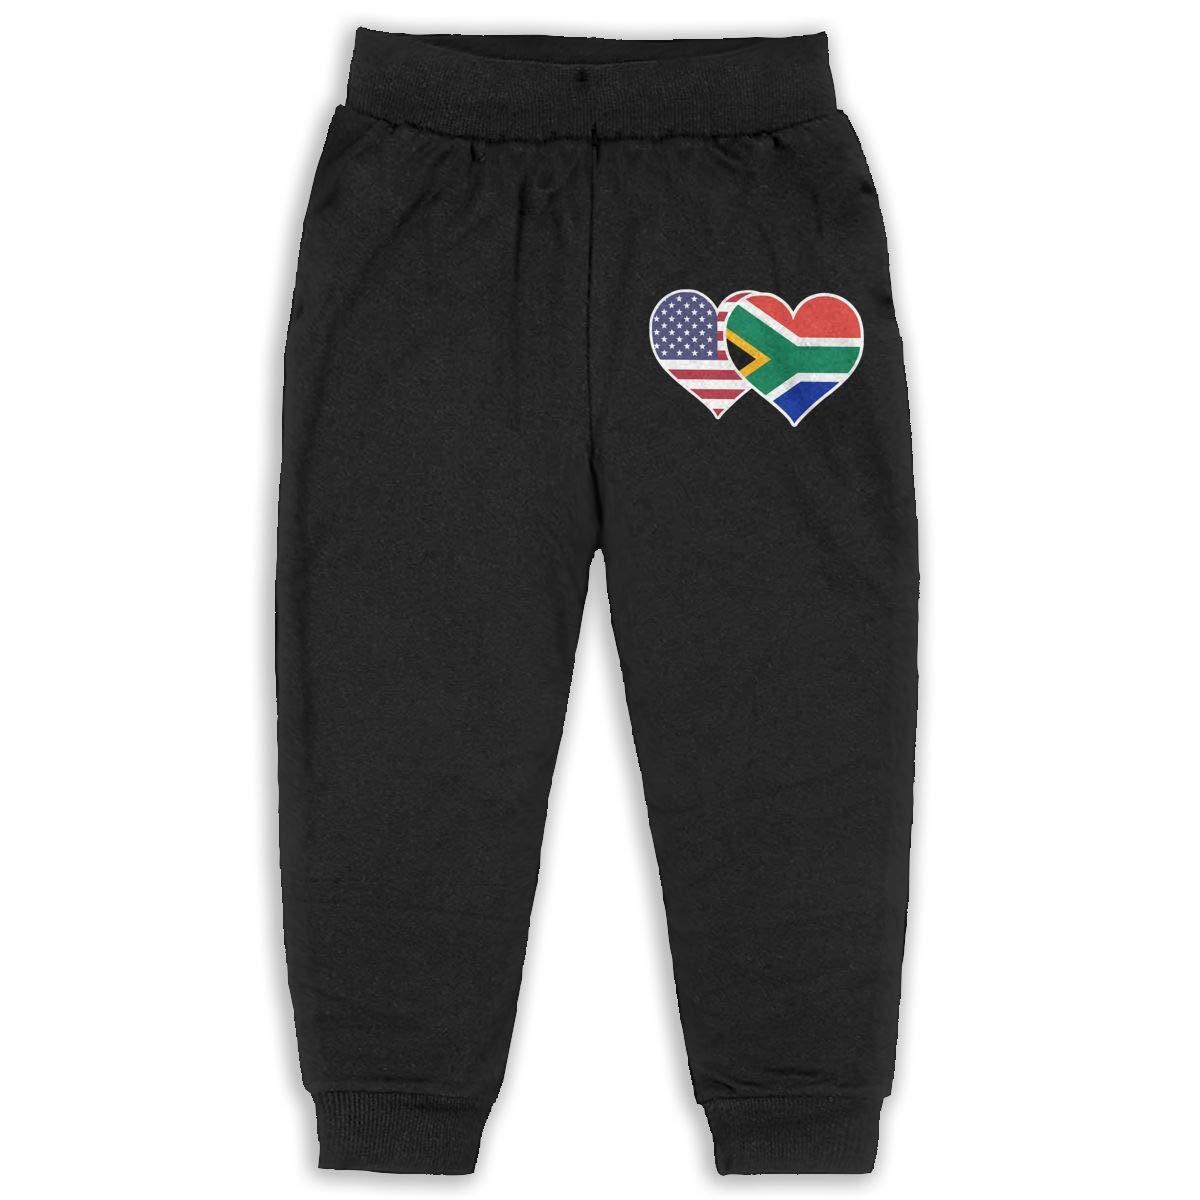 ELCW37K Kids /& Toddler Pants Soft Cozy Baby Sweatpants American South African Flag Heart Fleece Pants Training Pants